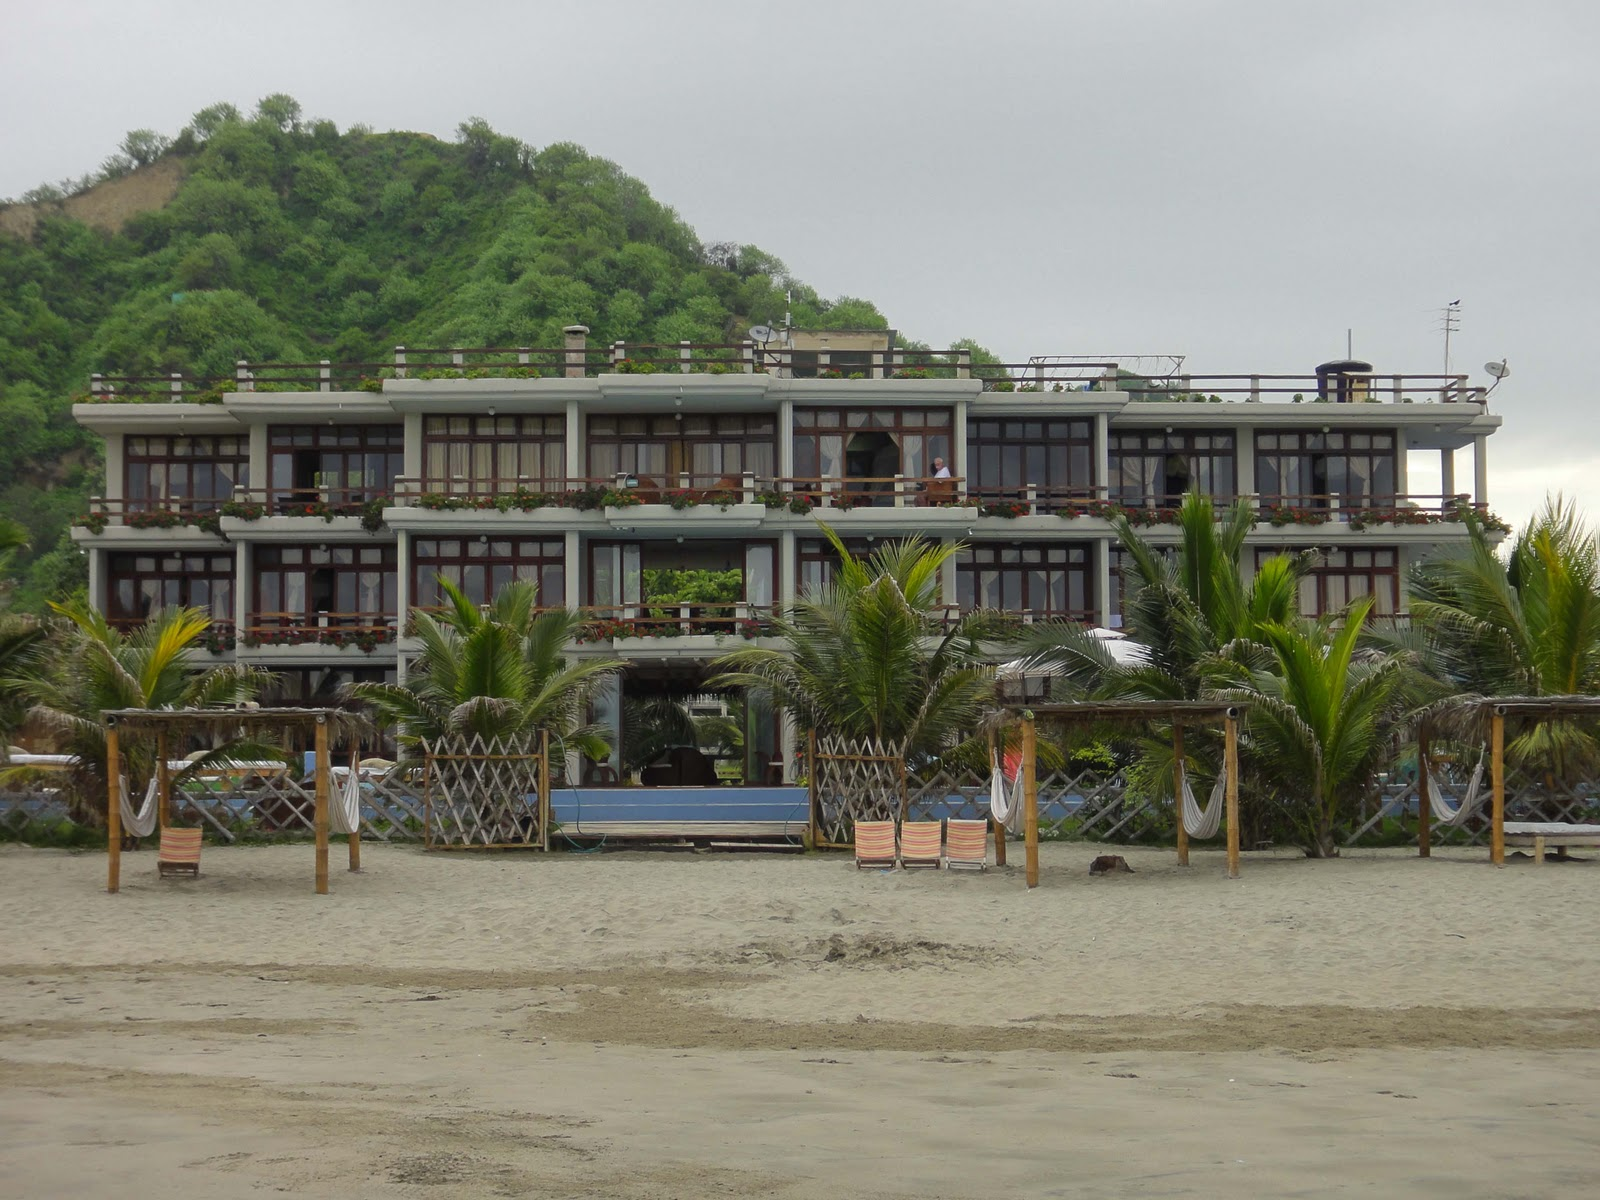 Beachfront Hotels San Luis Obispo